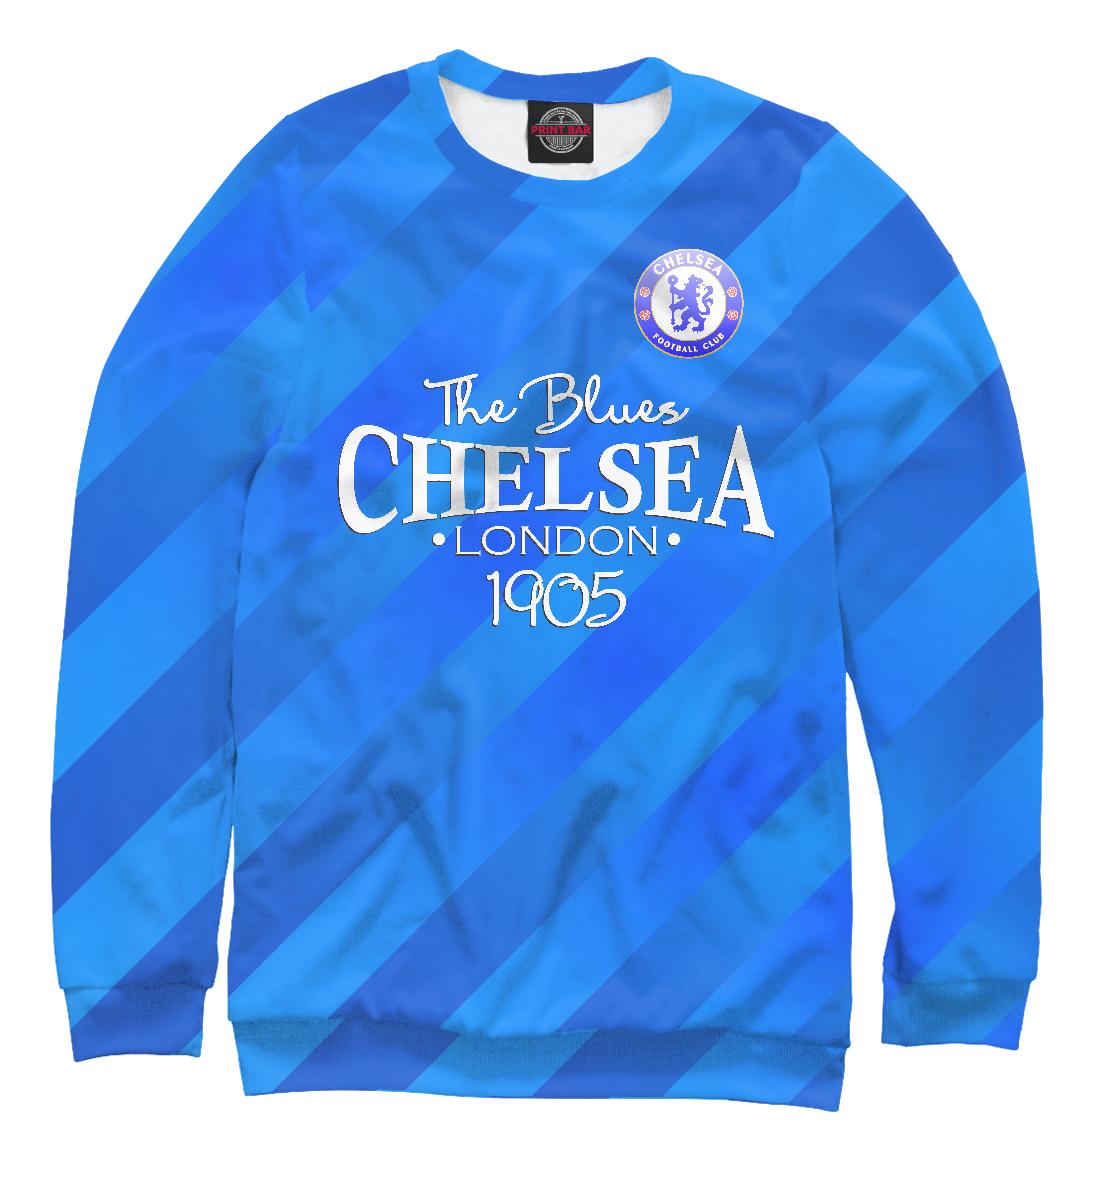 Фото - Chelsea-The Blues gary moore still got the blues